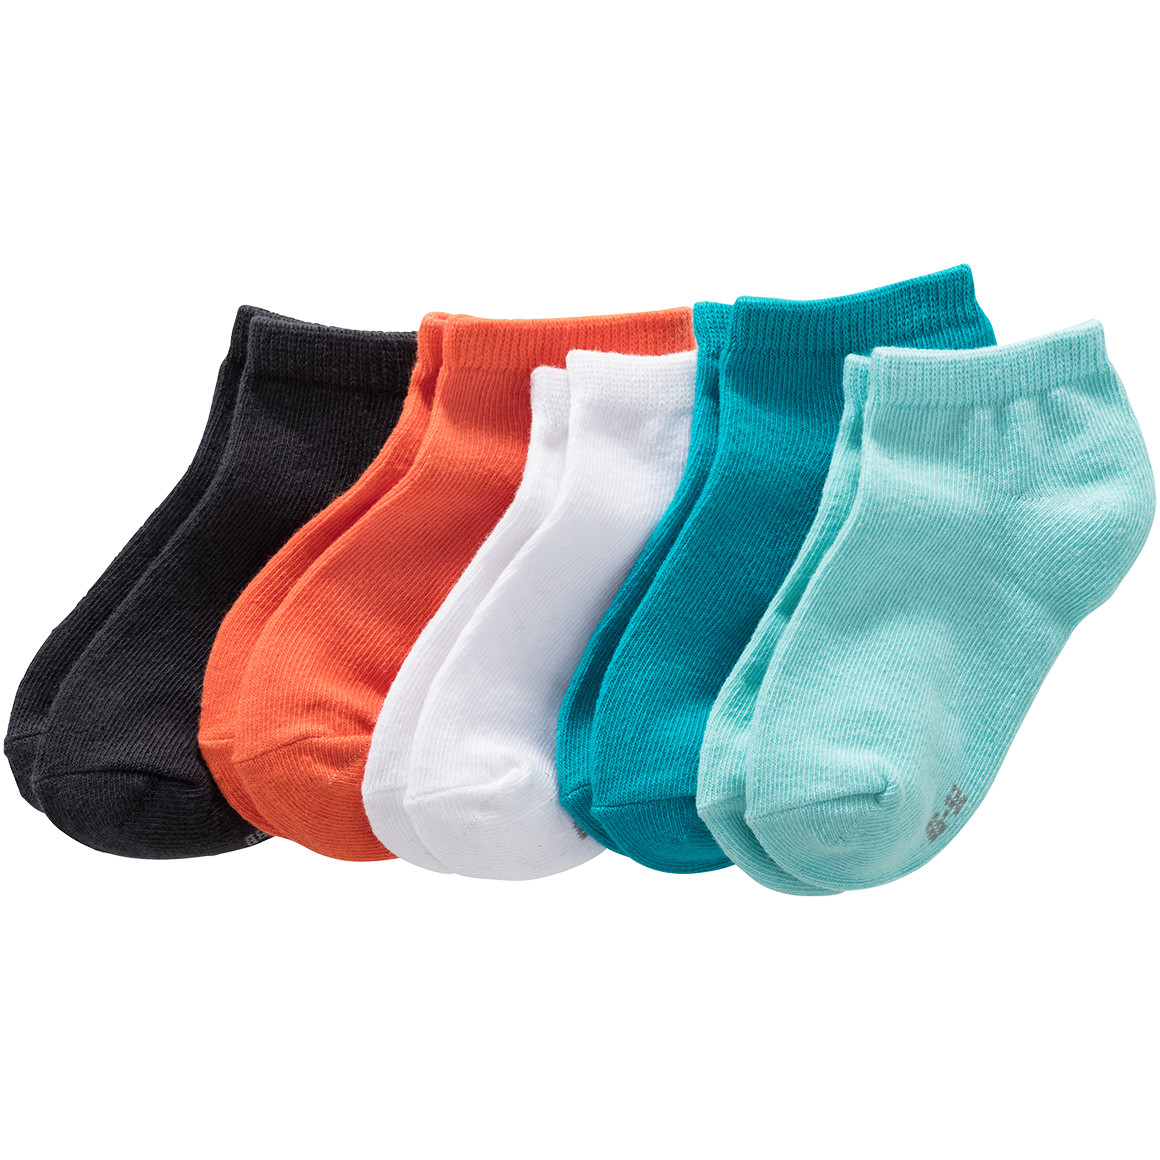 5 Paar Baby Sneaker Socken in Unifarben